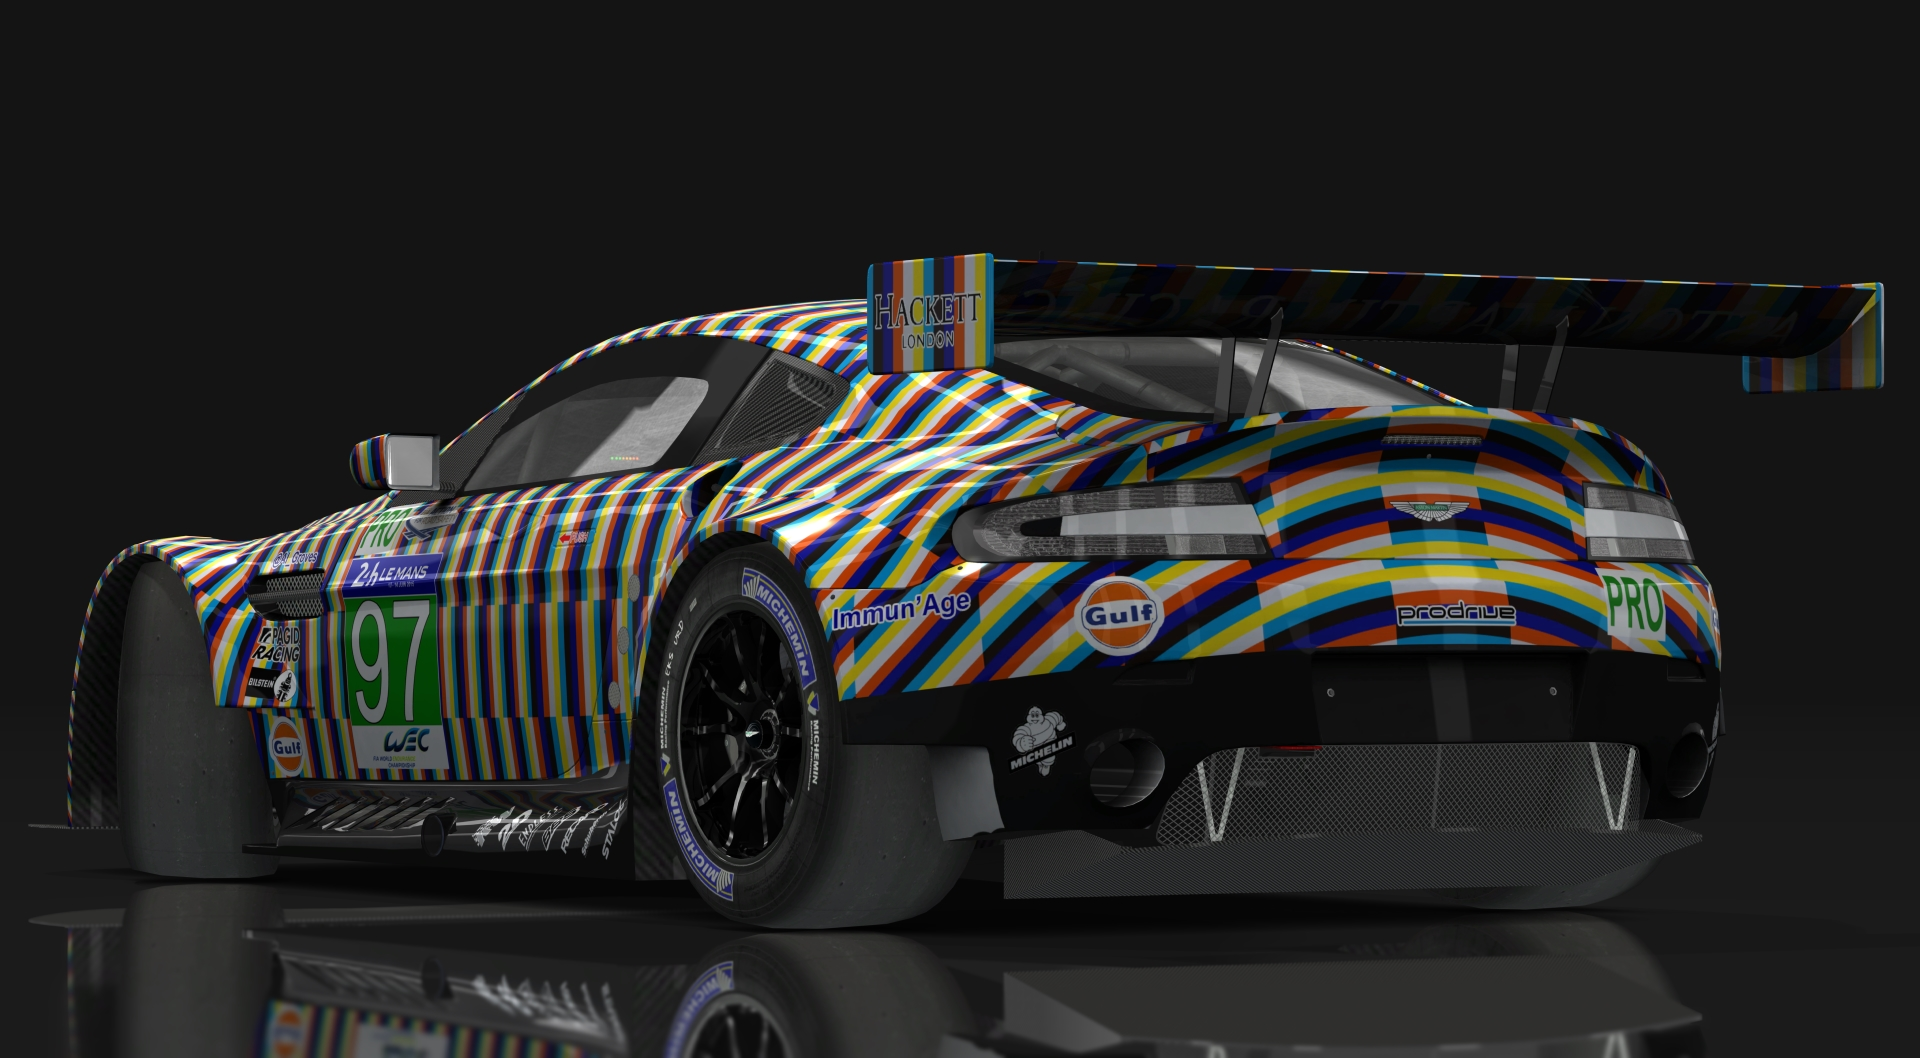 Aston_Martin_Racing_LM2015_3.jpg